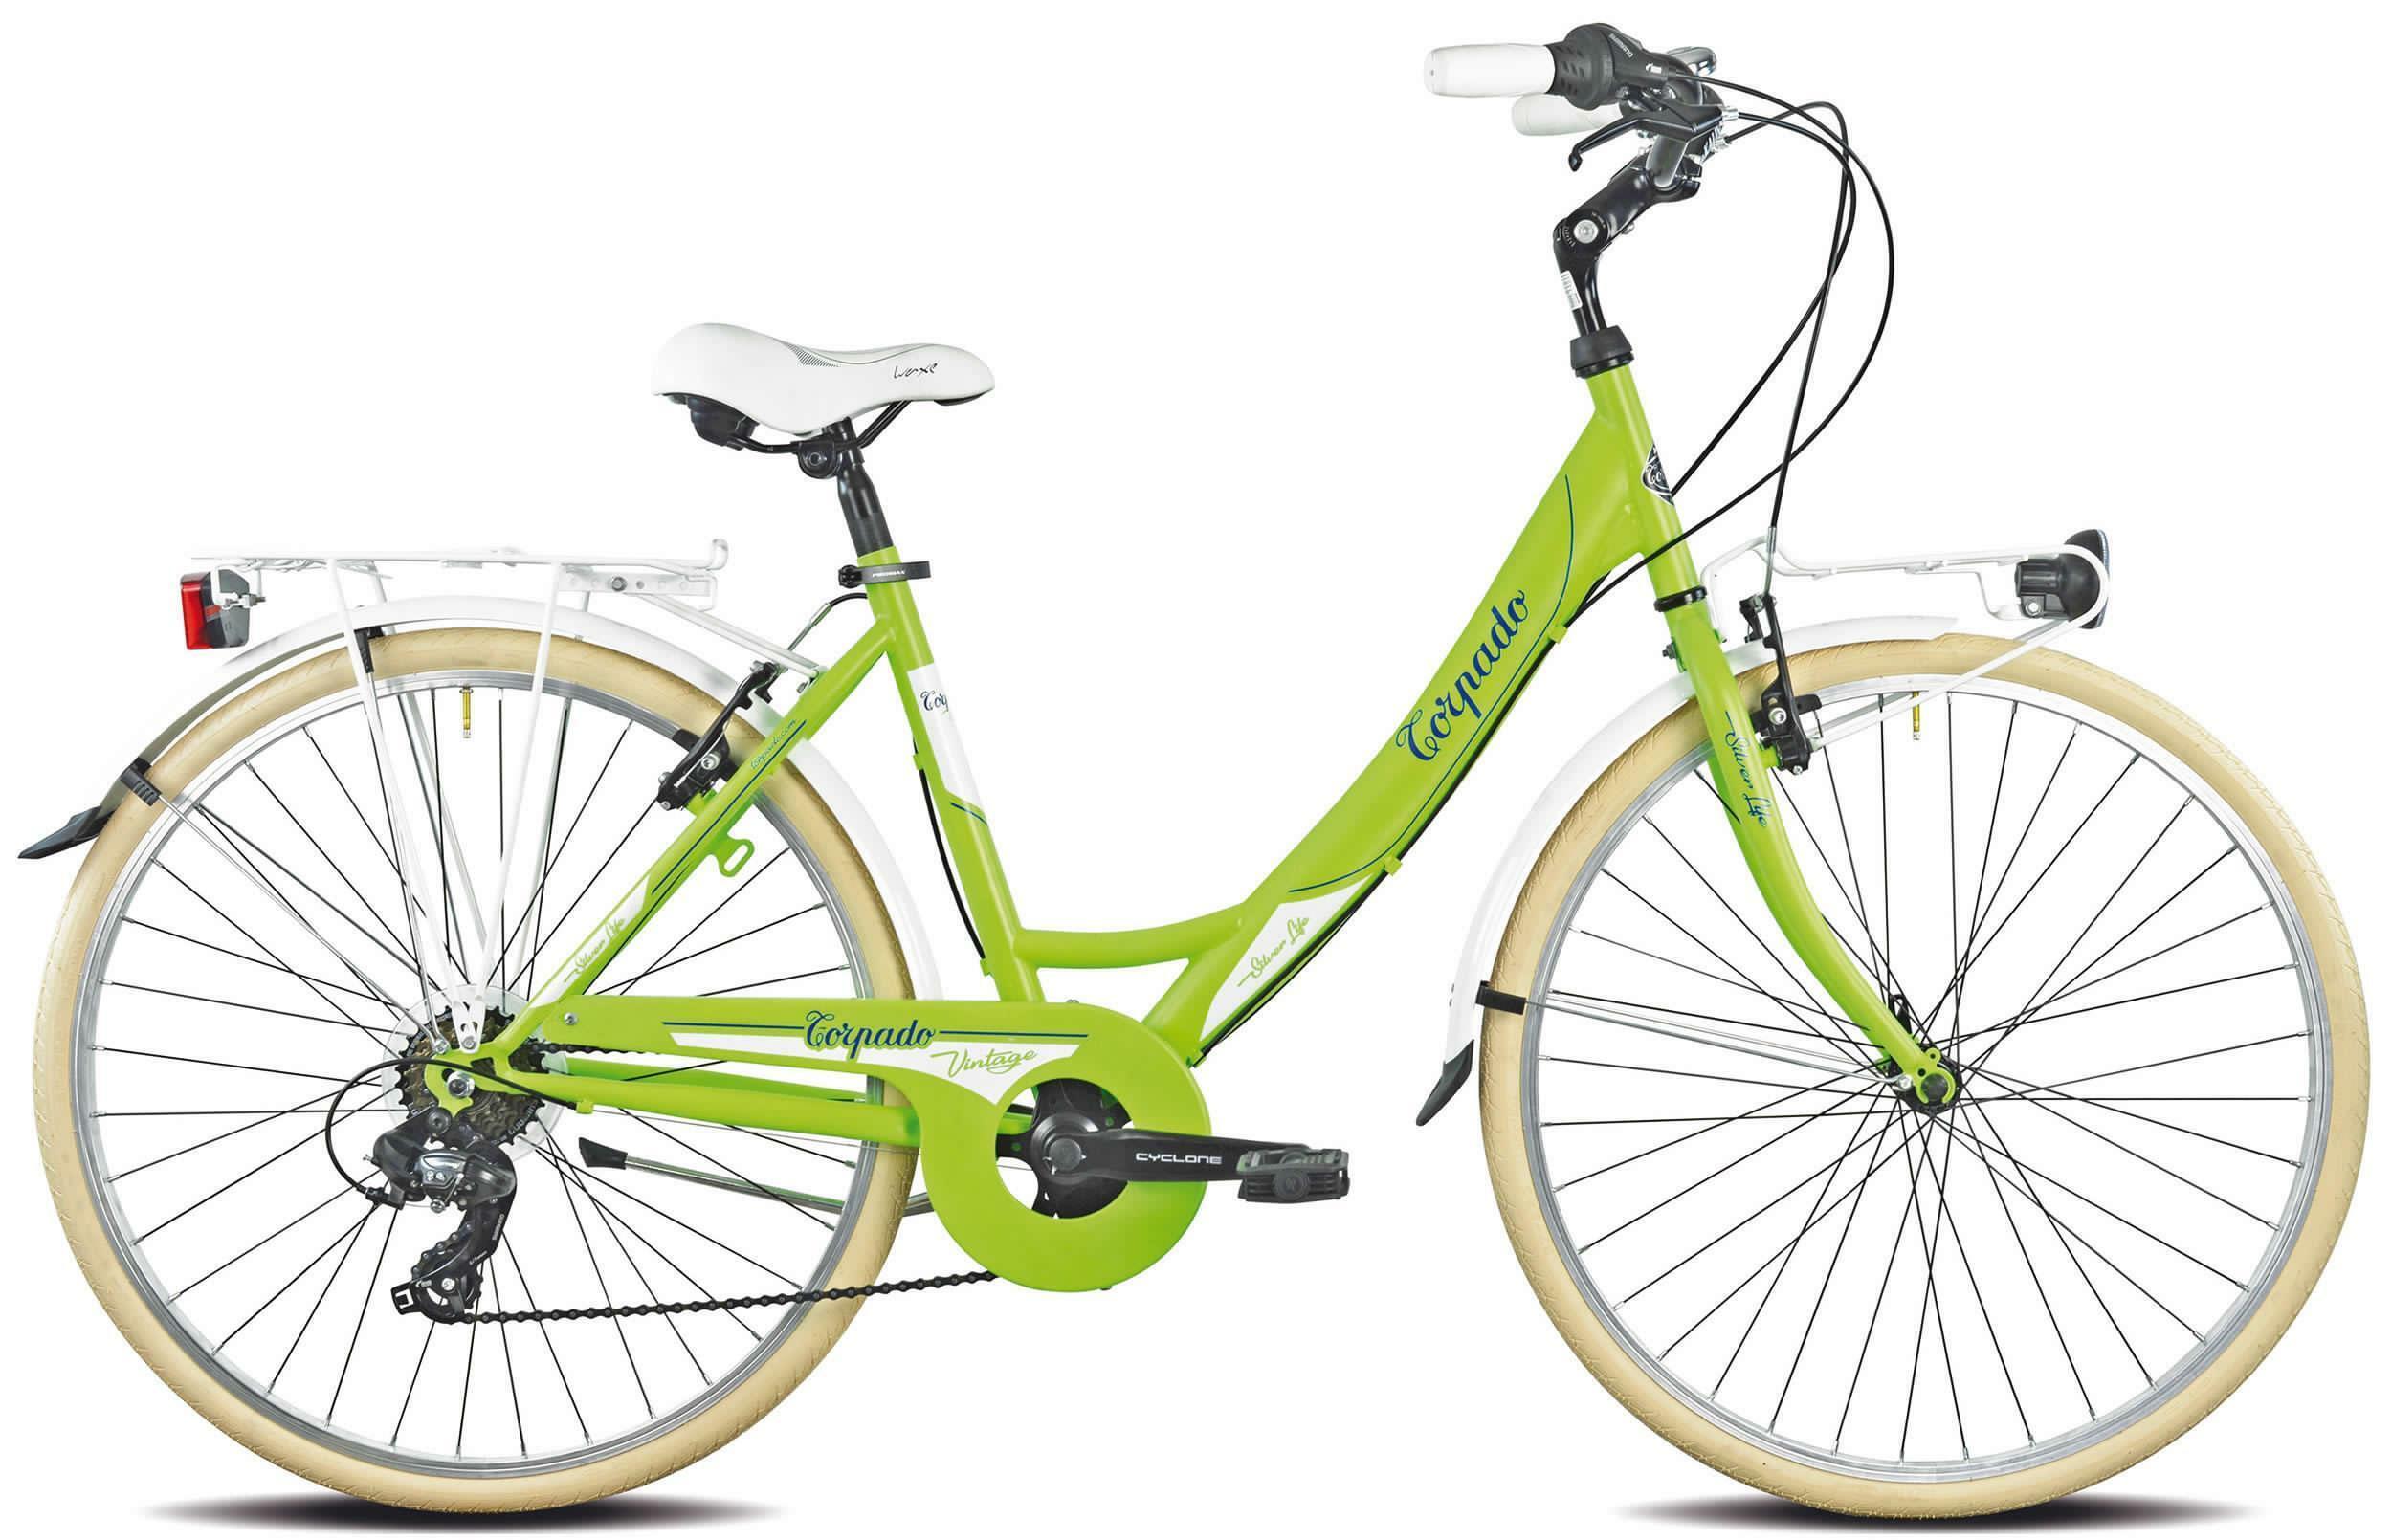 torpado torpado bici passeggio donna silverlife verde